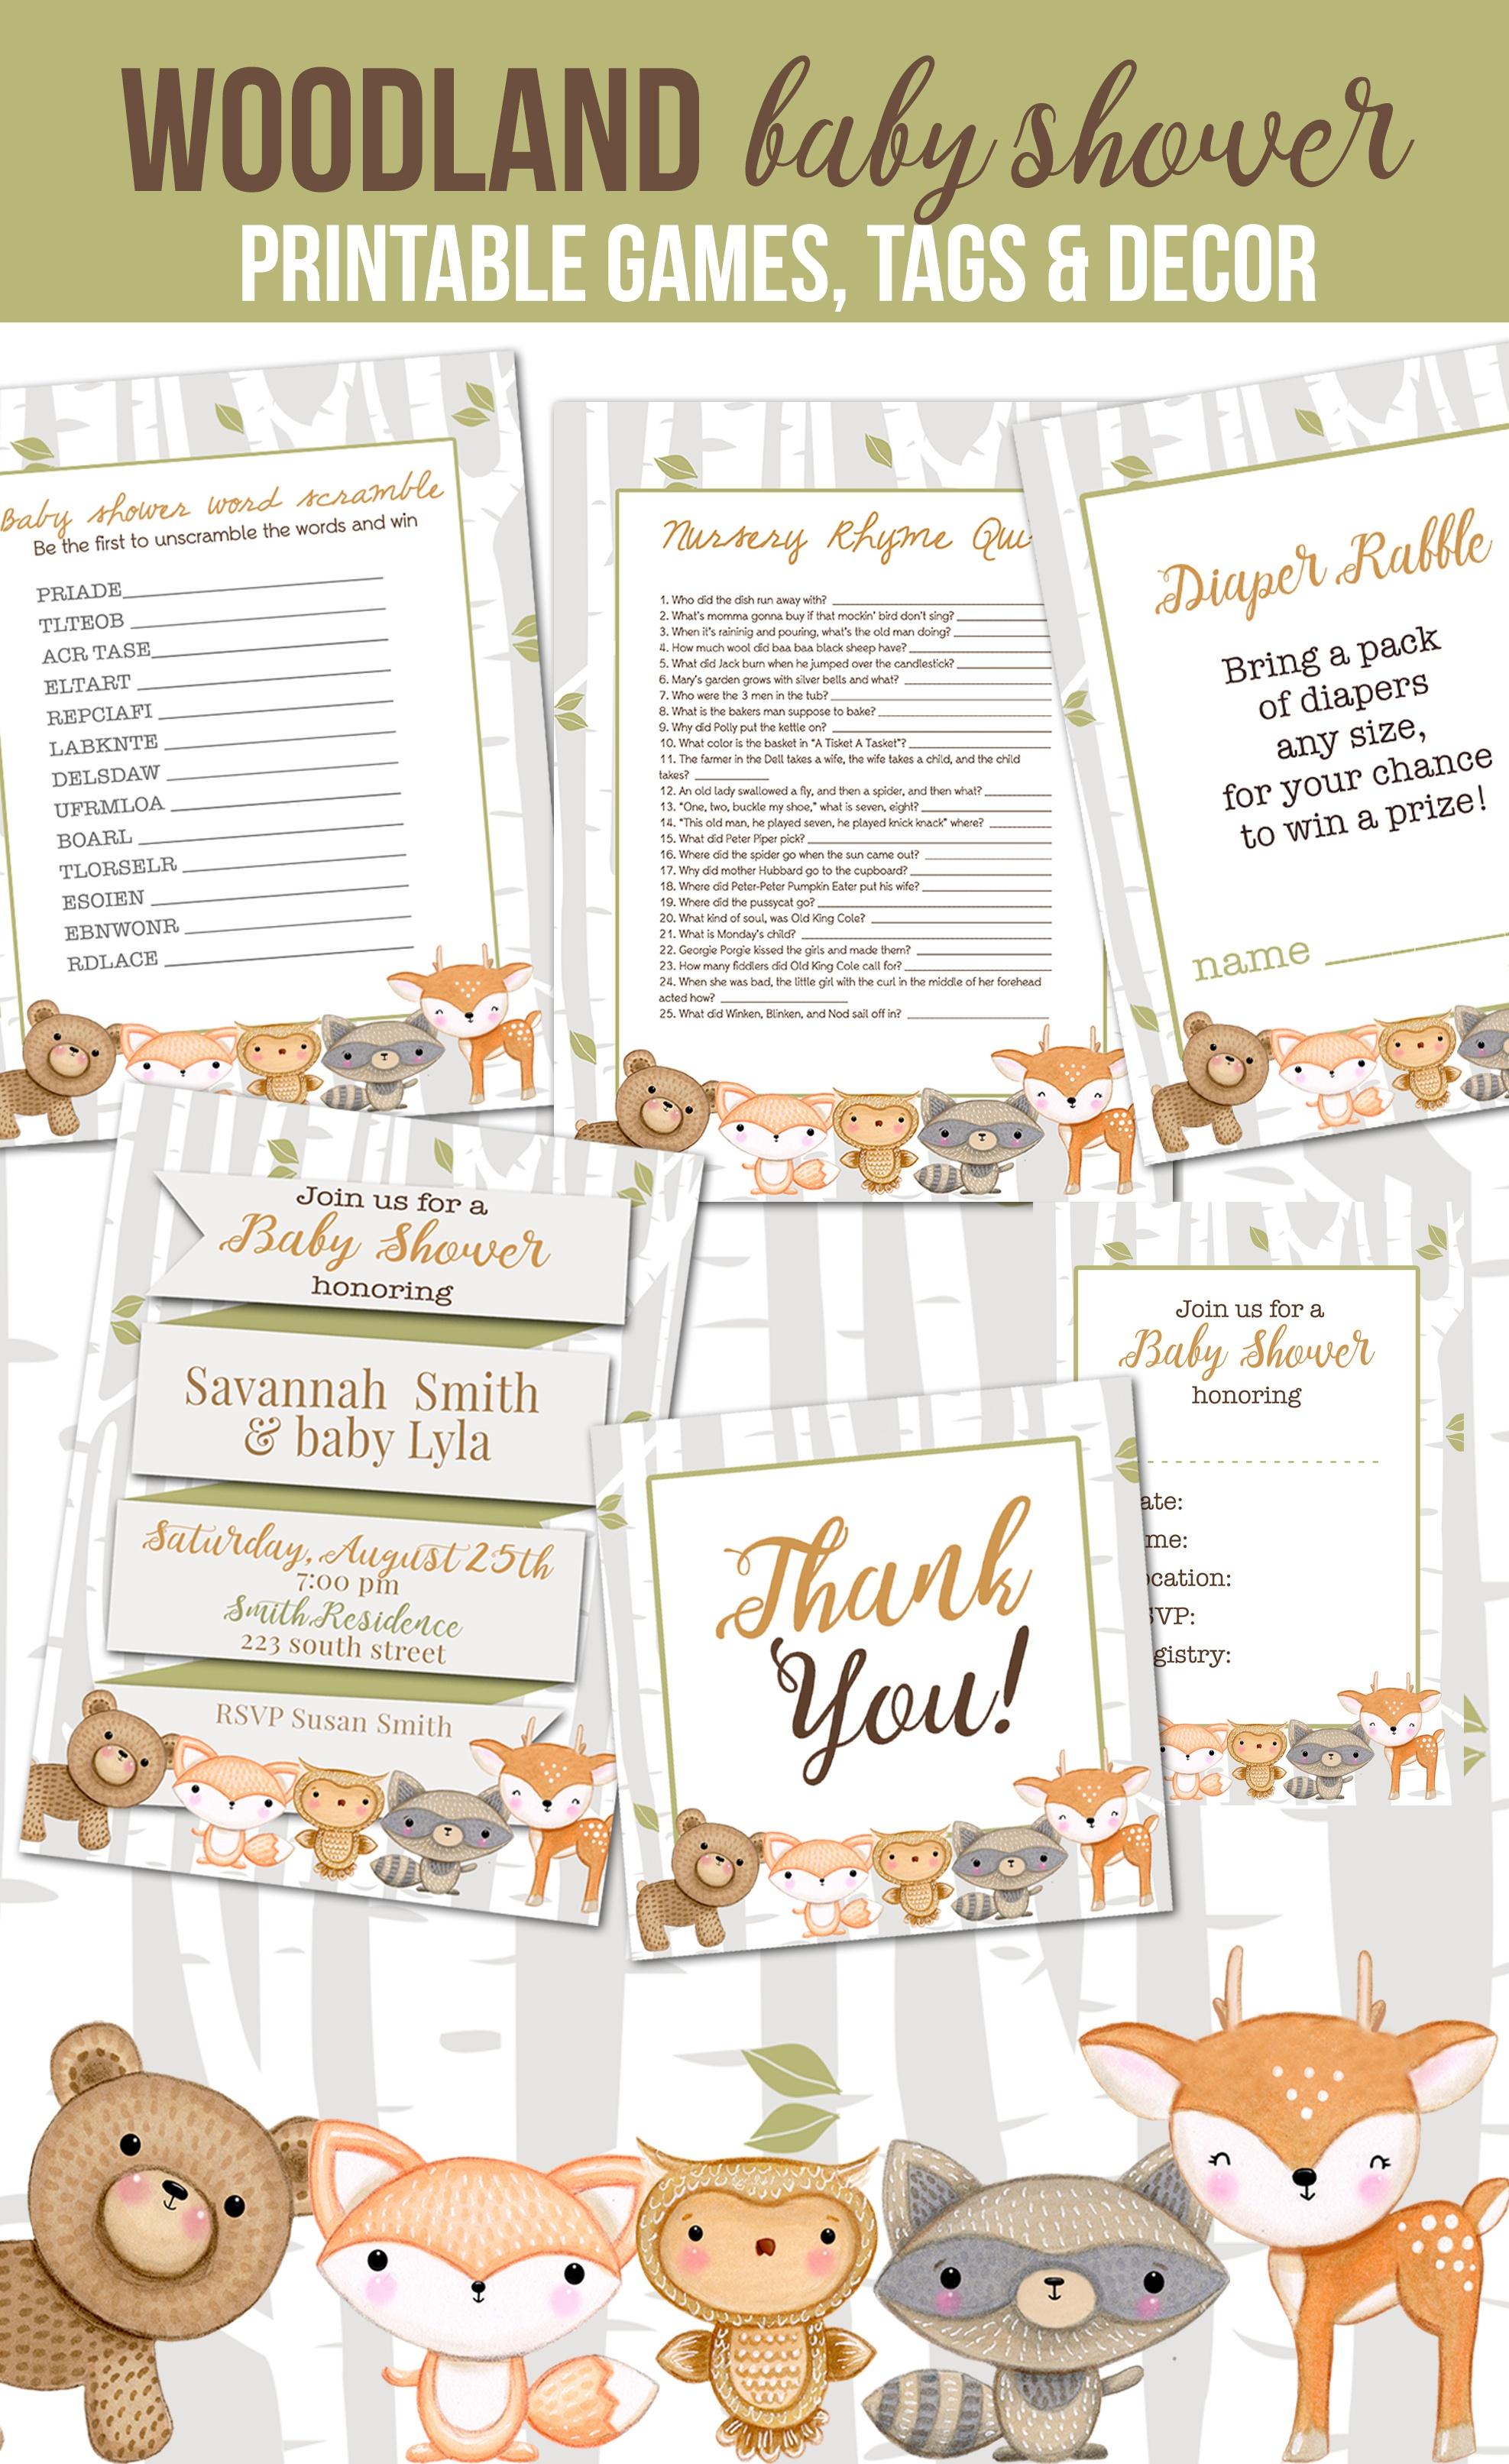 5 Darling Woodland Animal Baby Shower Free Printables And Ideas For - Free Woodland Animal Printables